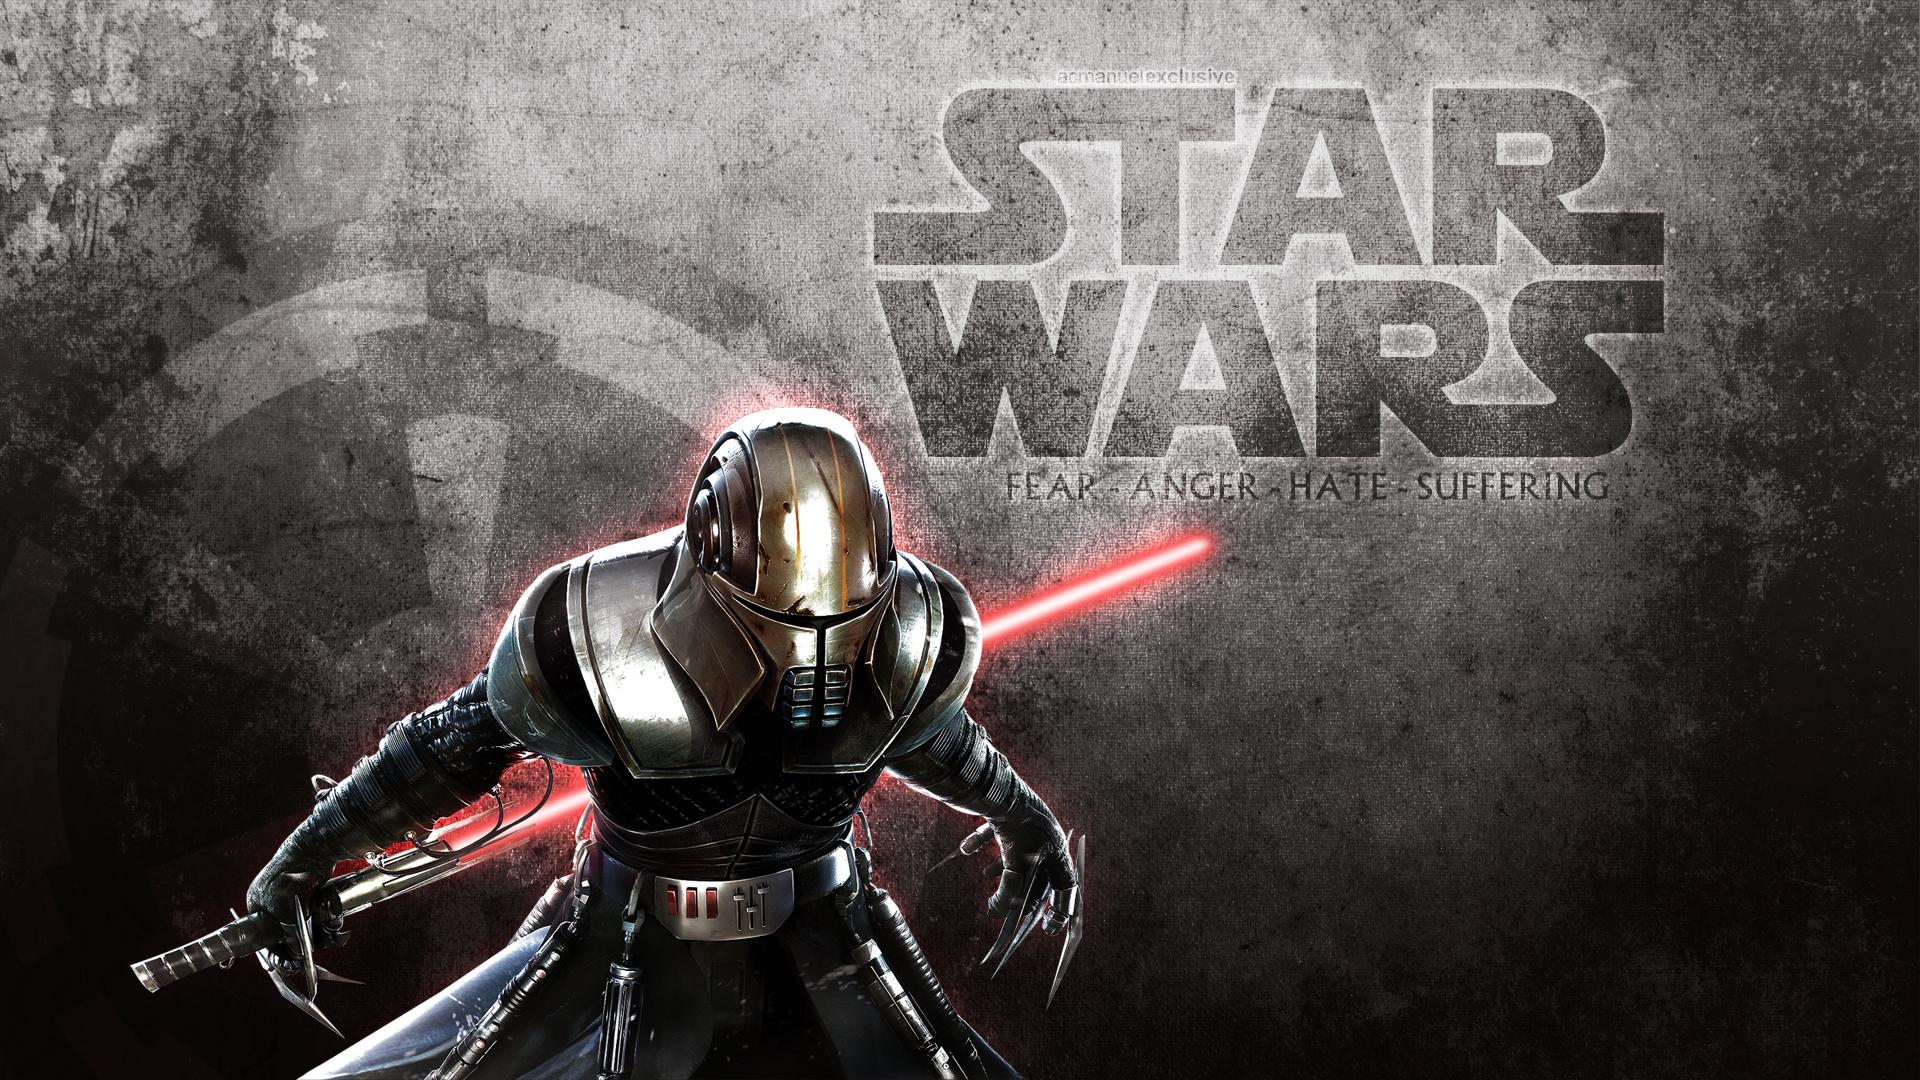 Sith Star Wars Wallpaper   HD Wallpapers 1920x1080